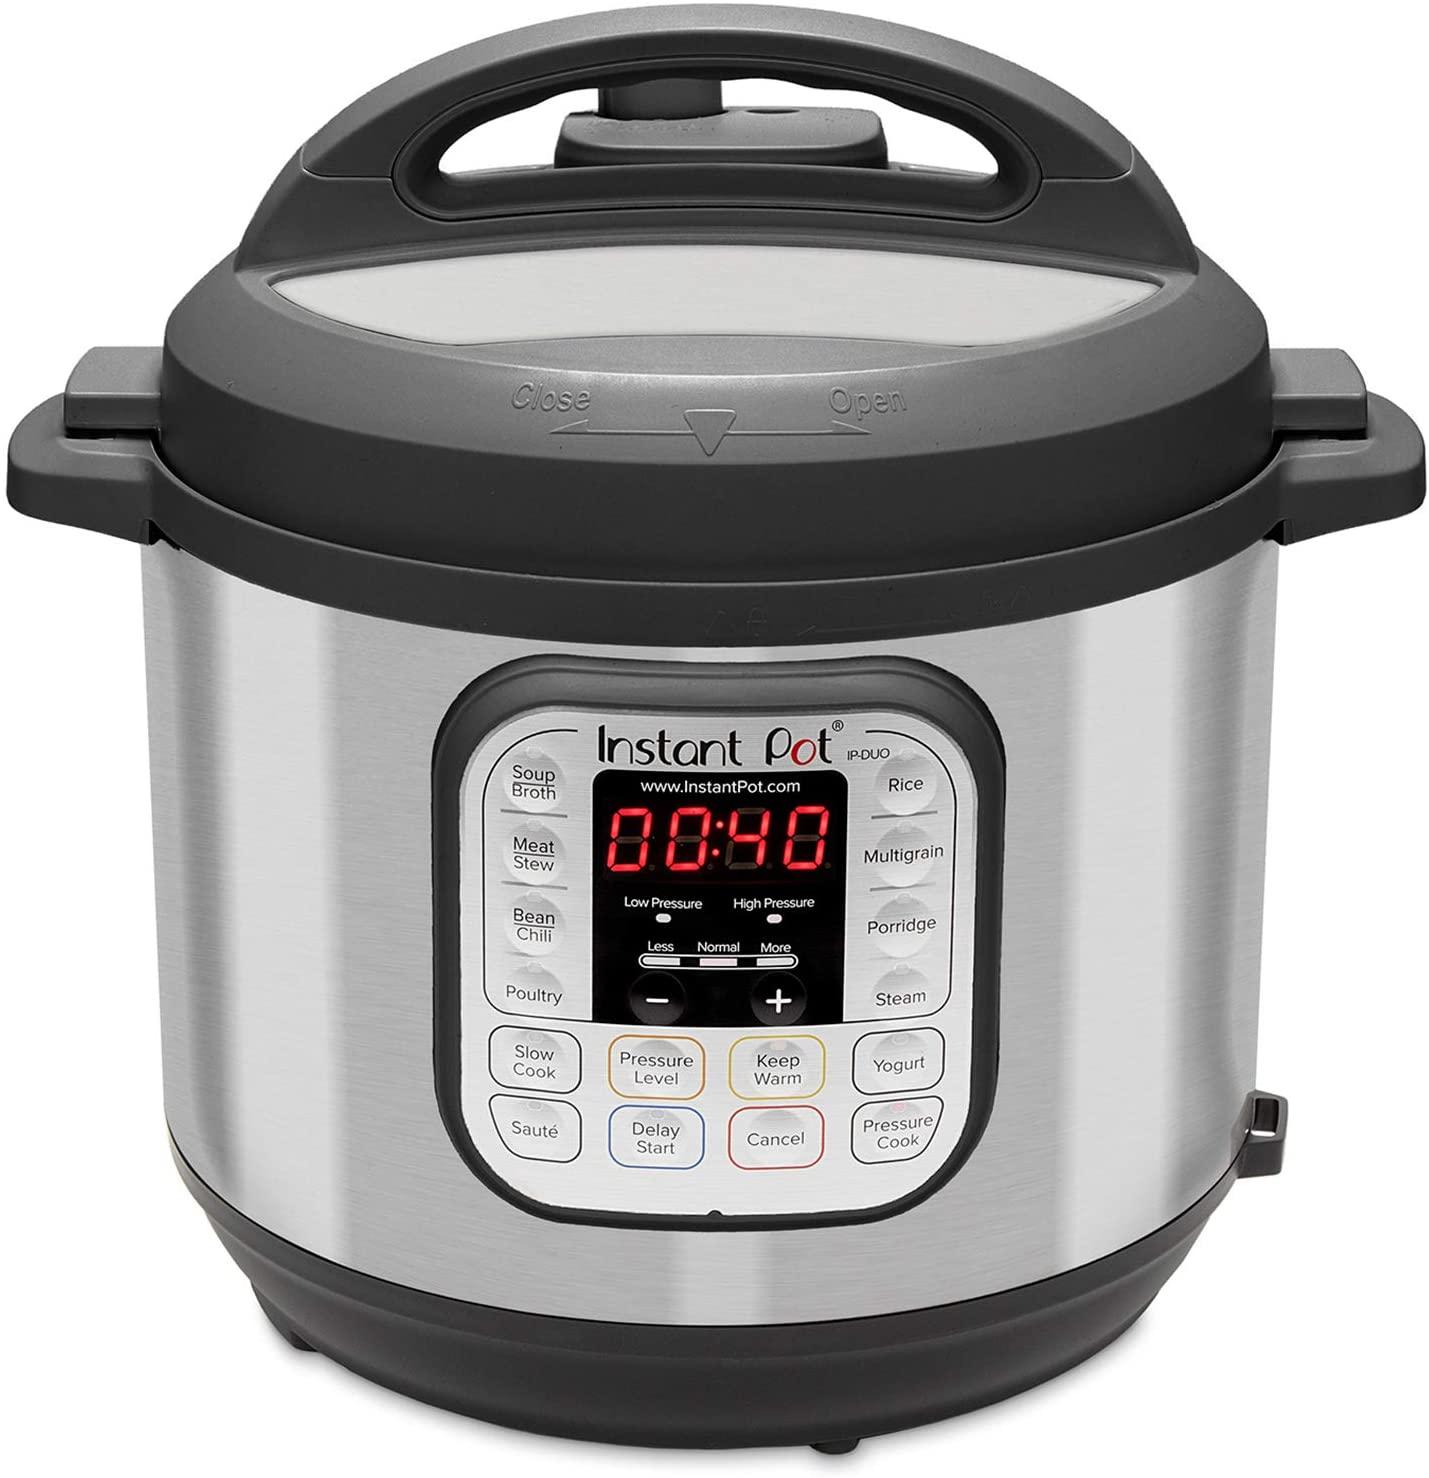 Pressure cooker2